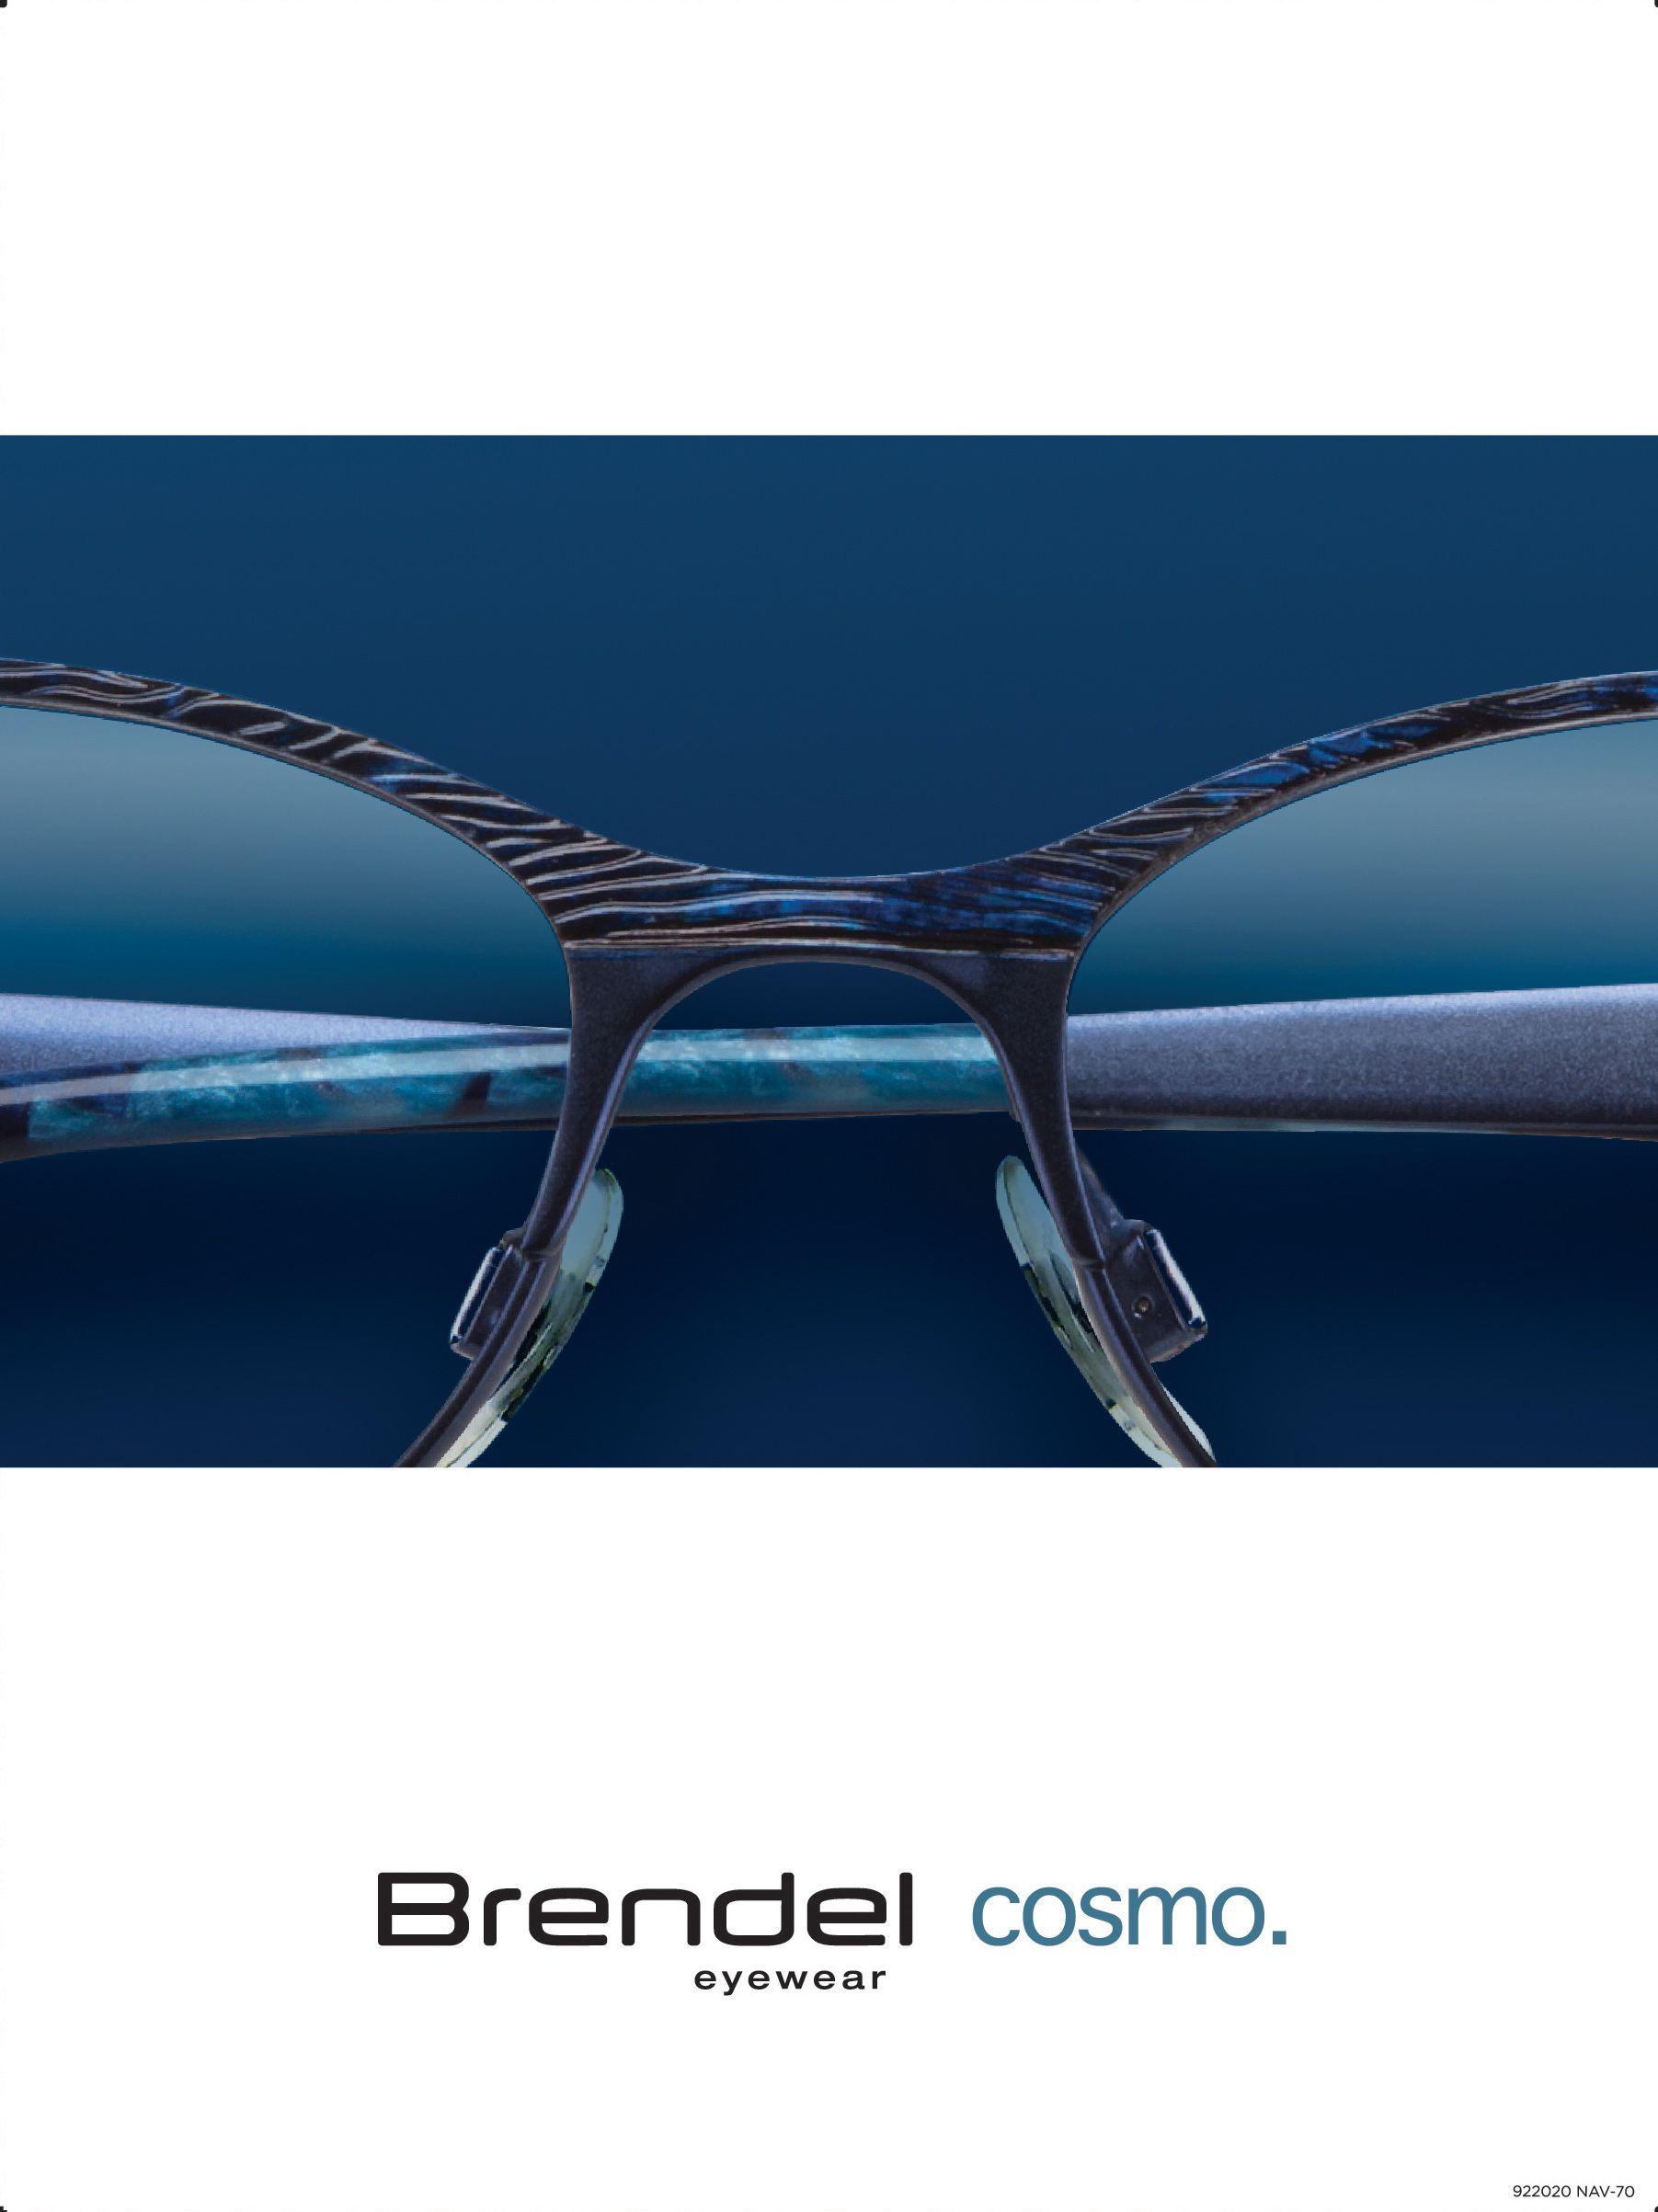 Brendel Cosmo Collection 922020 Navy Eyewear Optical Frames Cosmos